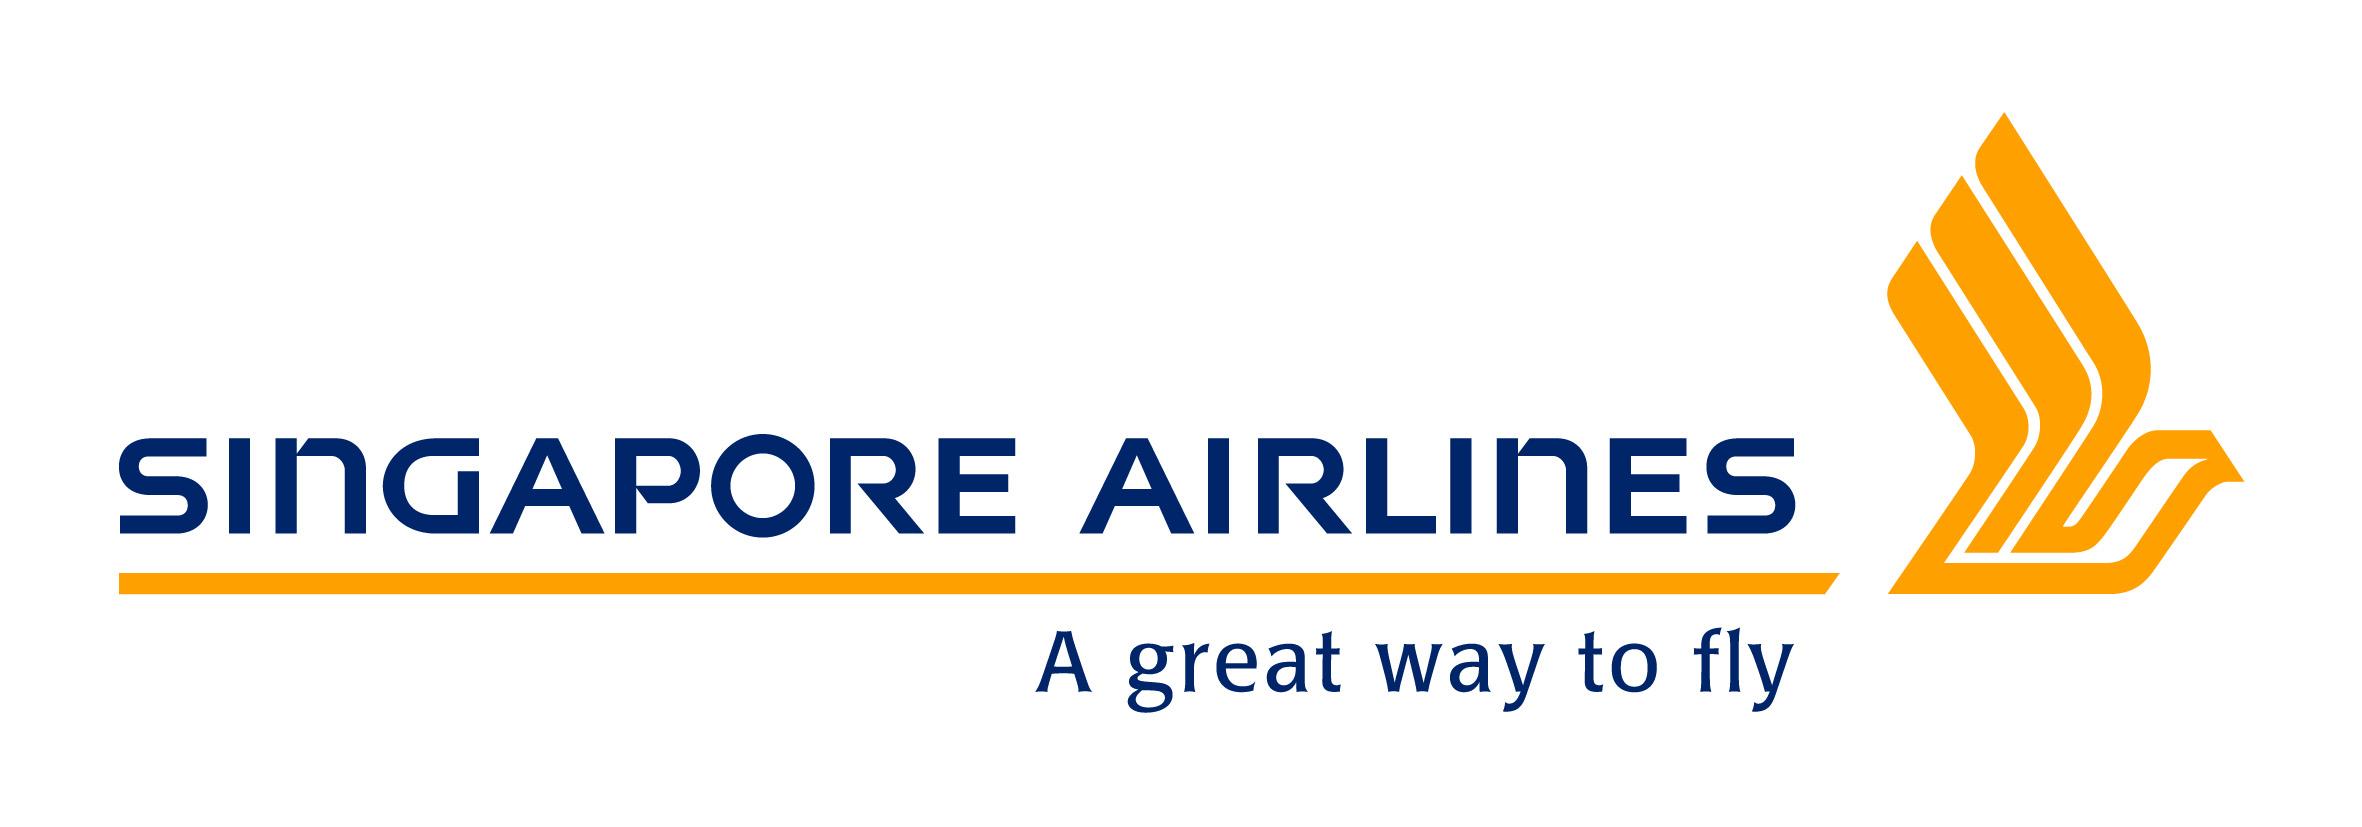 SIA linear_white bg yellow logo_Apr 2018.jpg